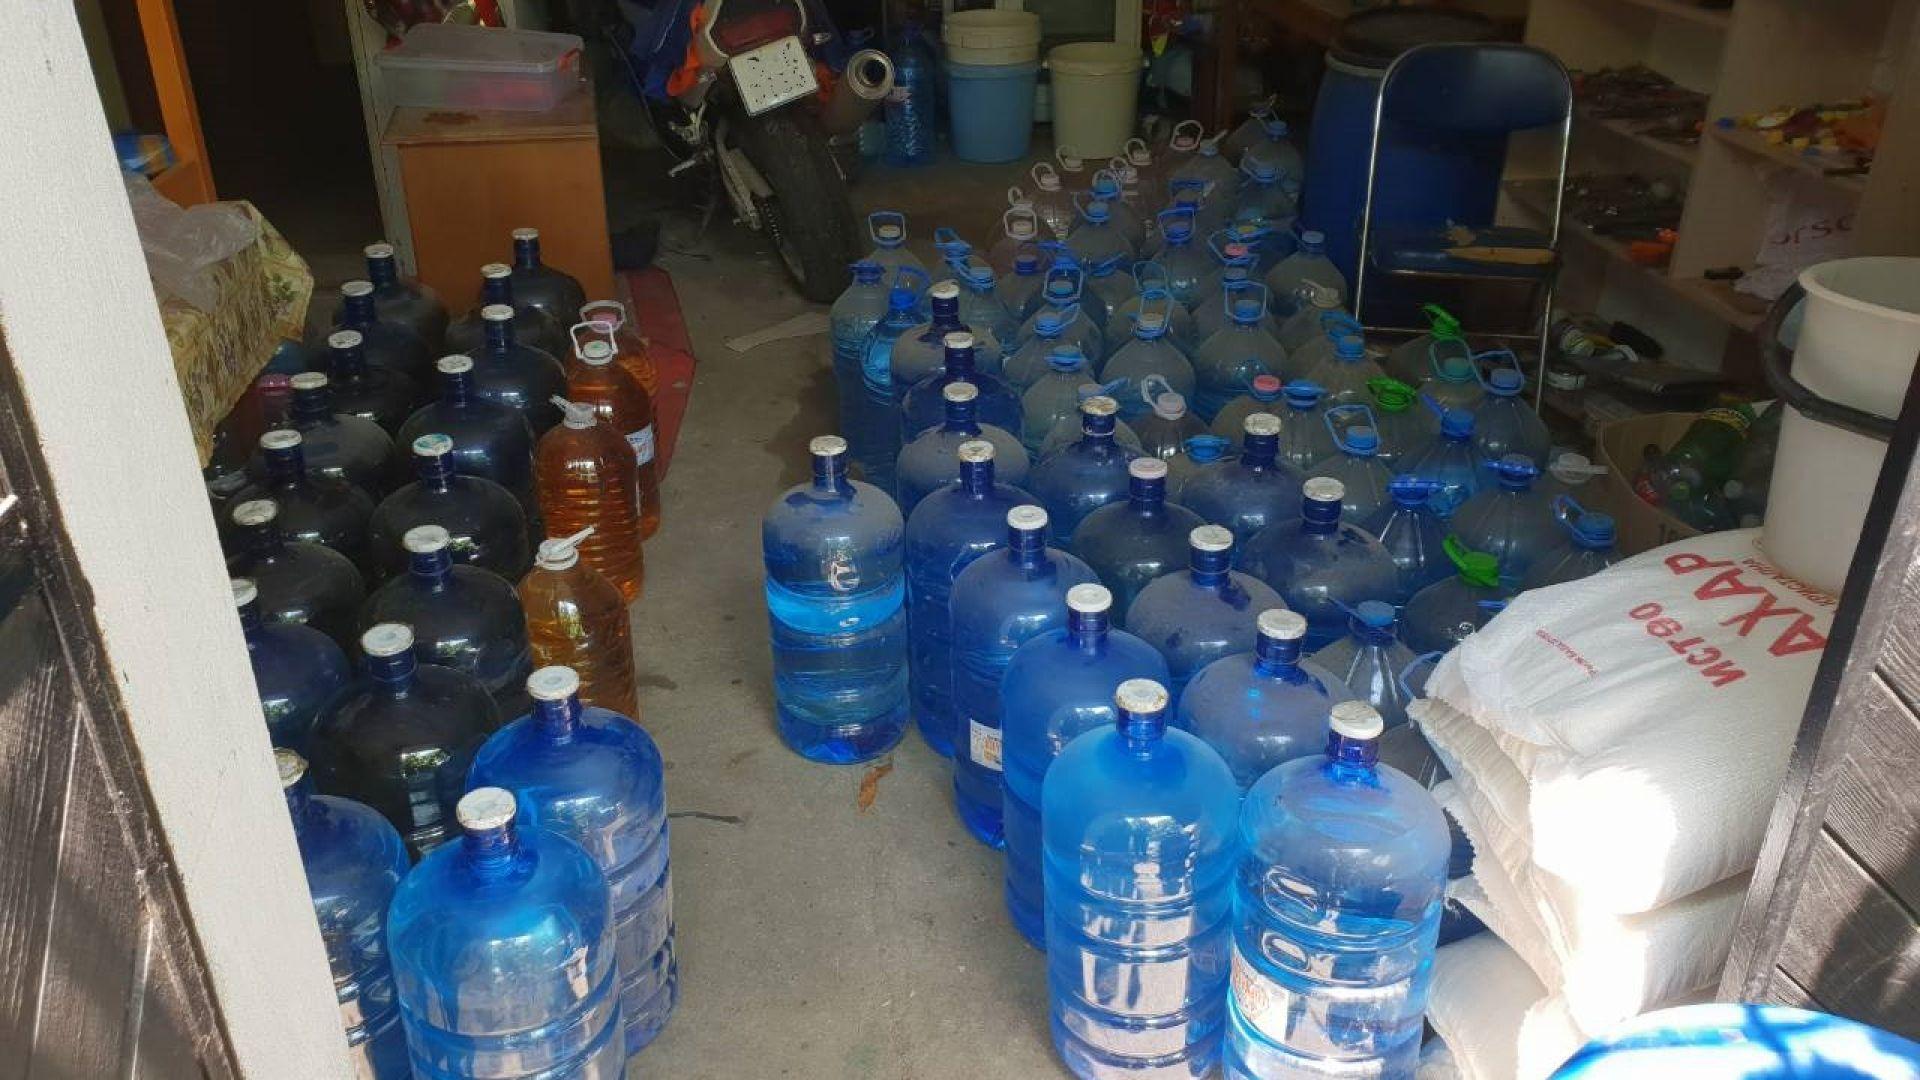 Откриха тон и половина алкохол в гараж в Аксаково